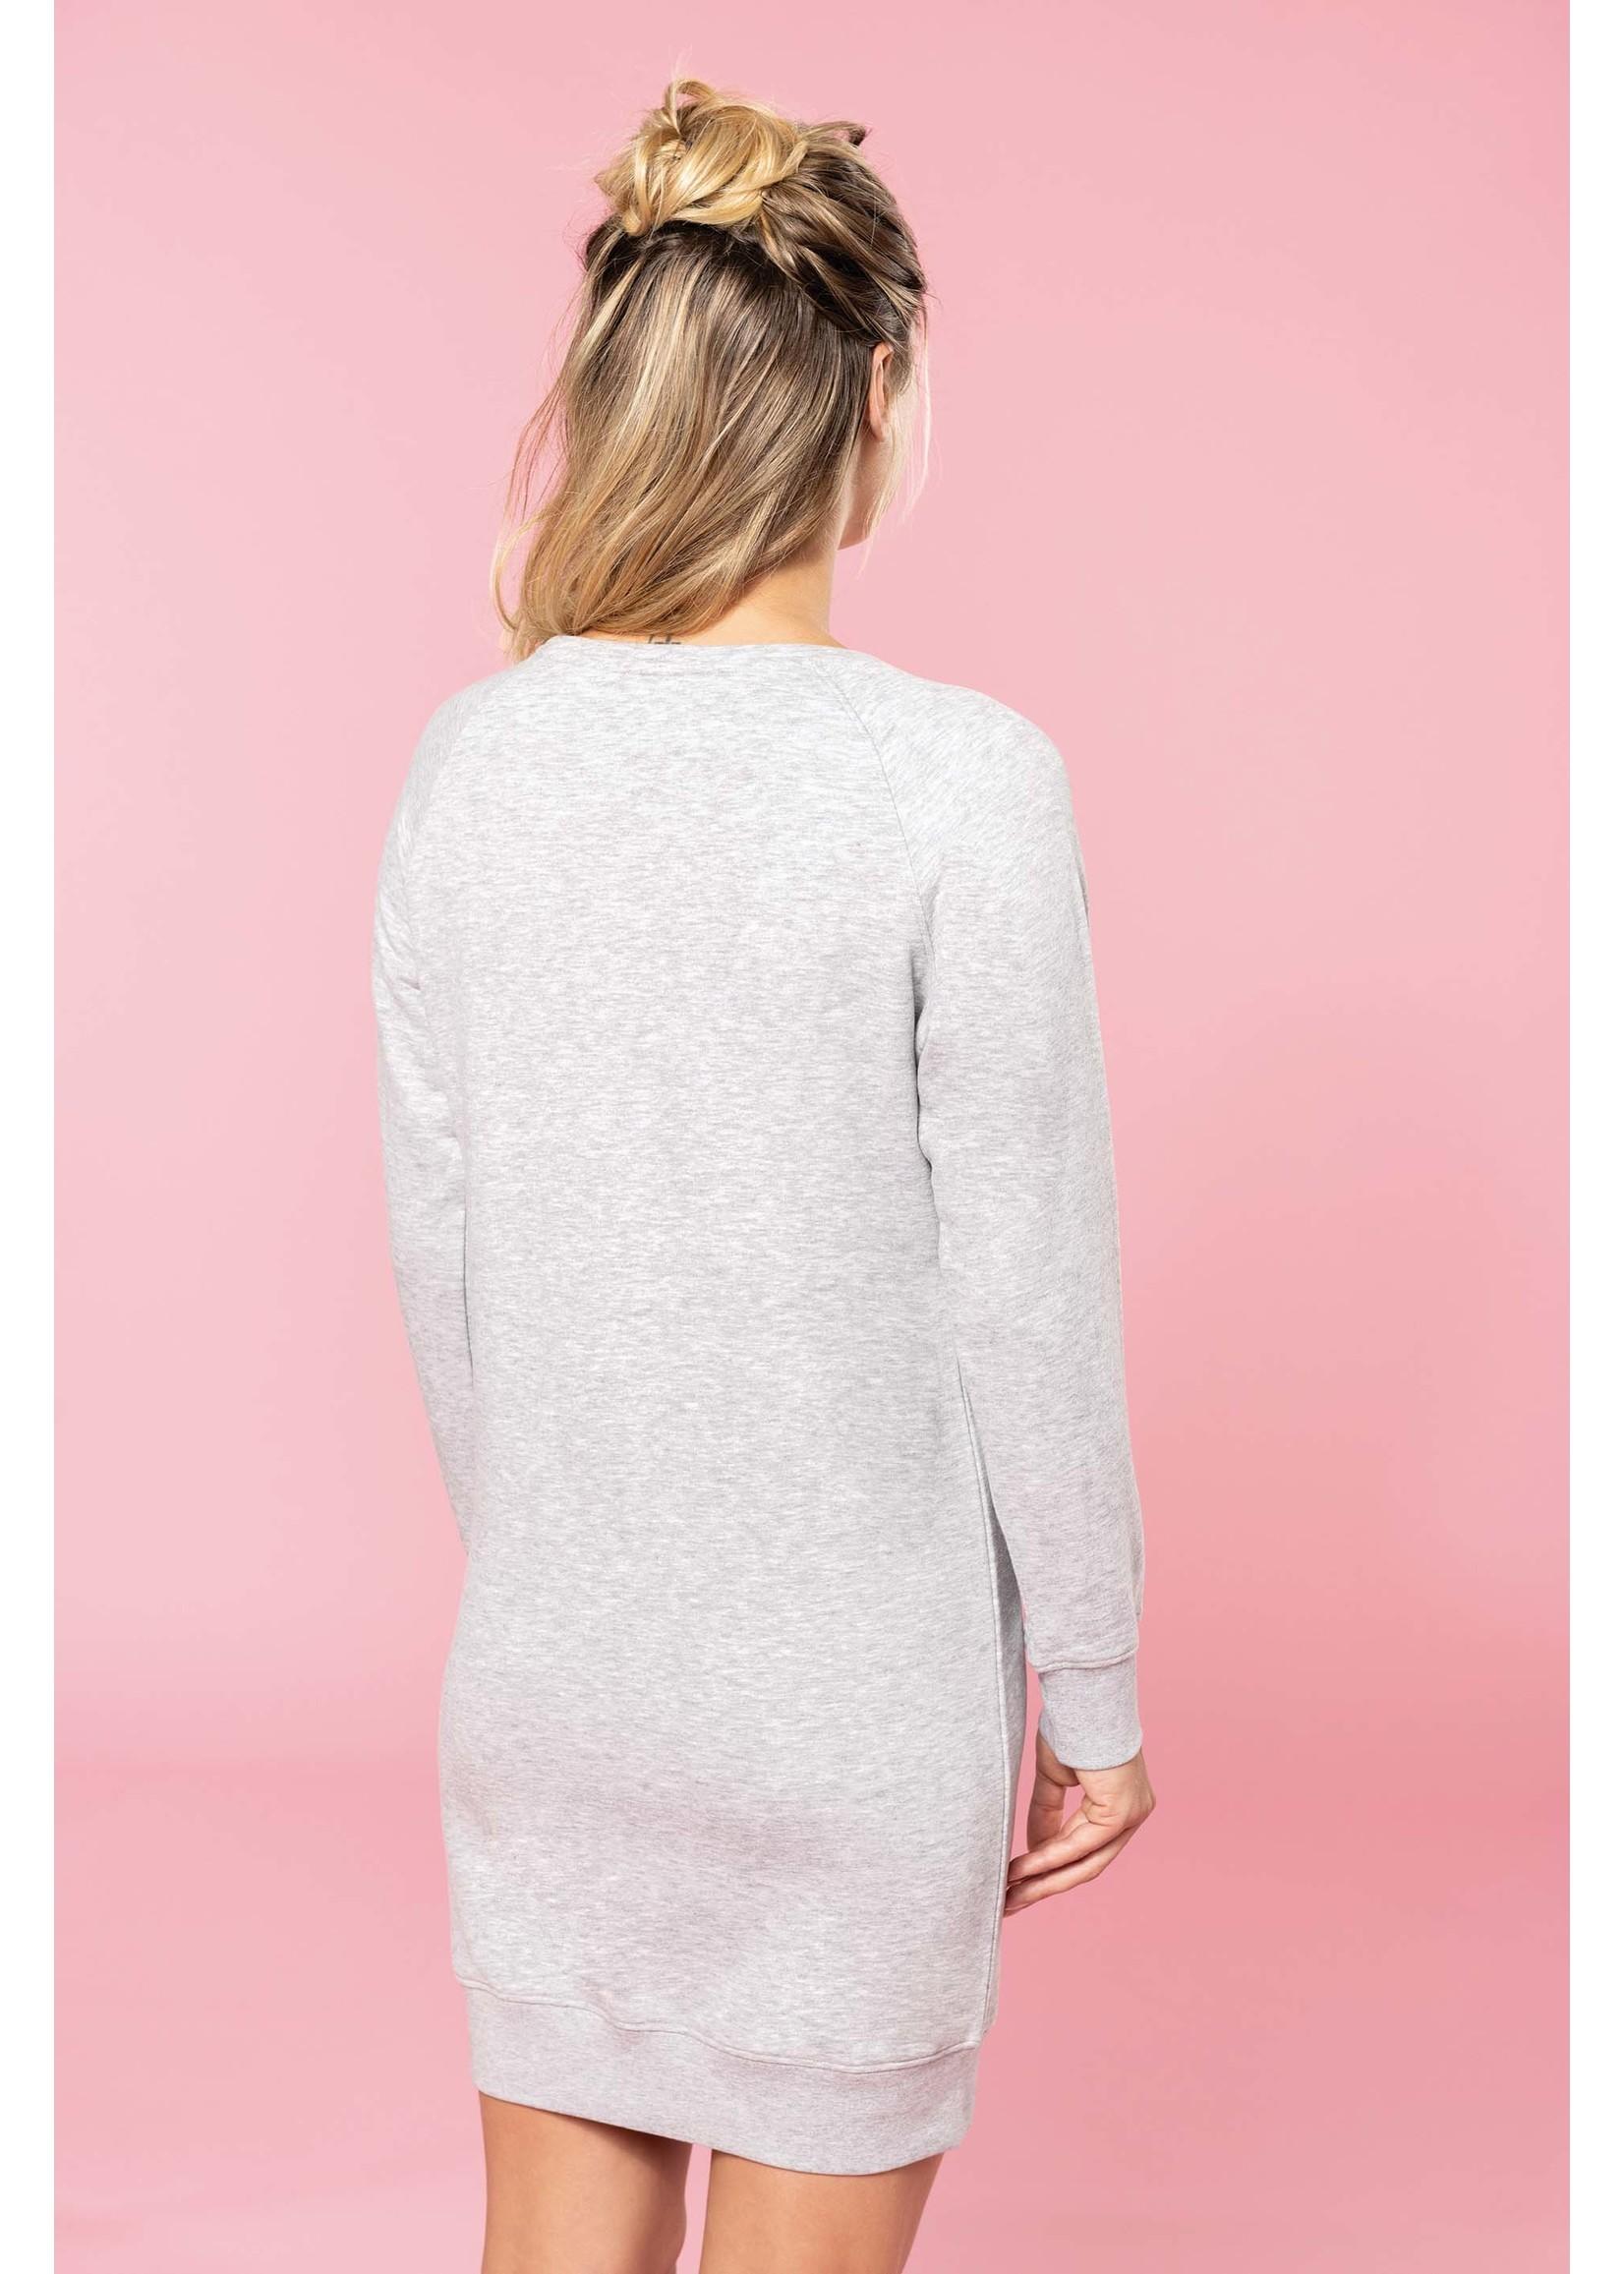 Lounge jurk Bio in fleece Lightgrey-Heather